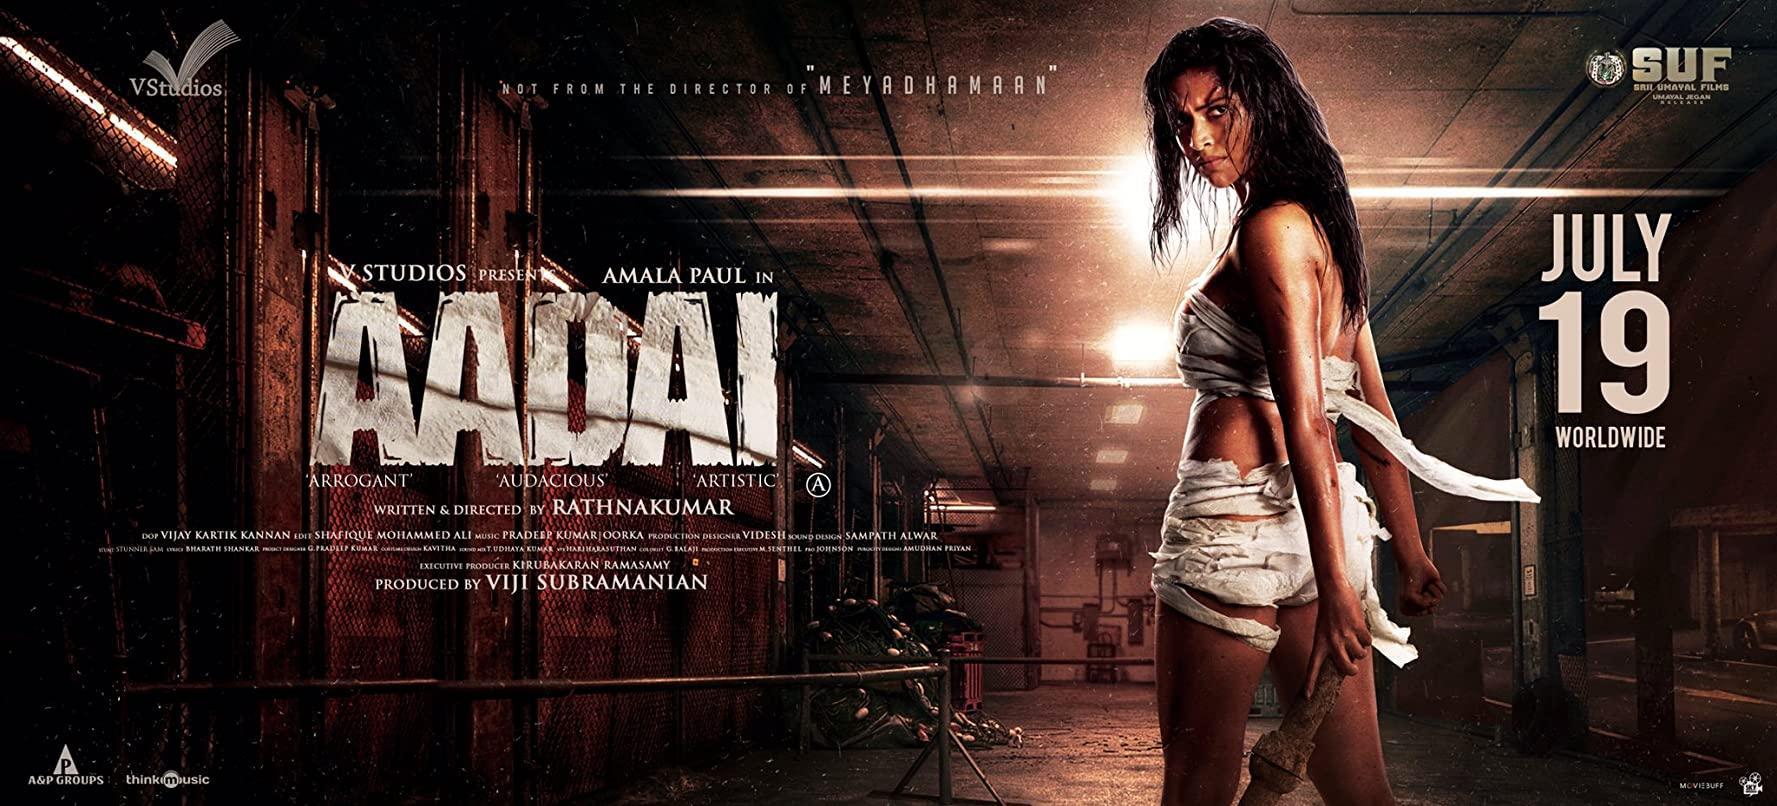 مشاهدة فيلم Aadai (2019) مترجم HD اون لاين